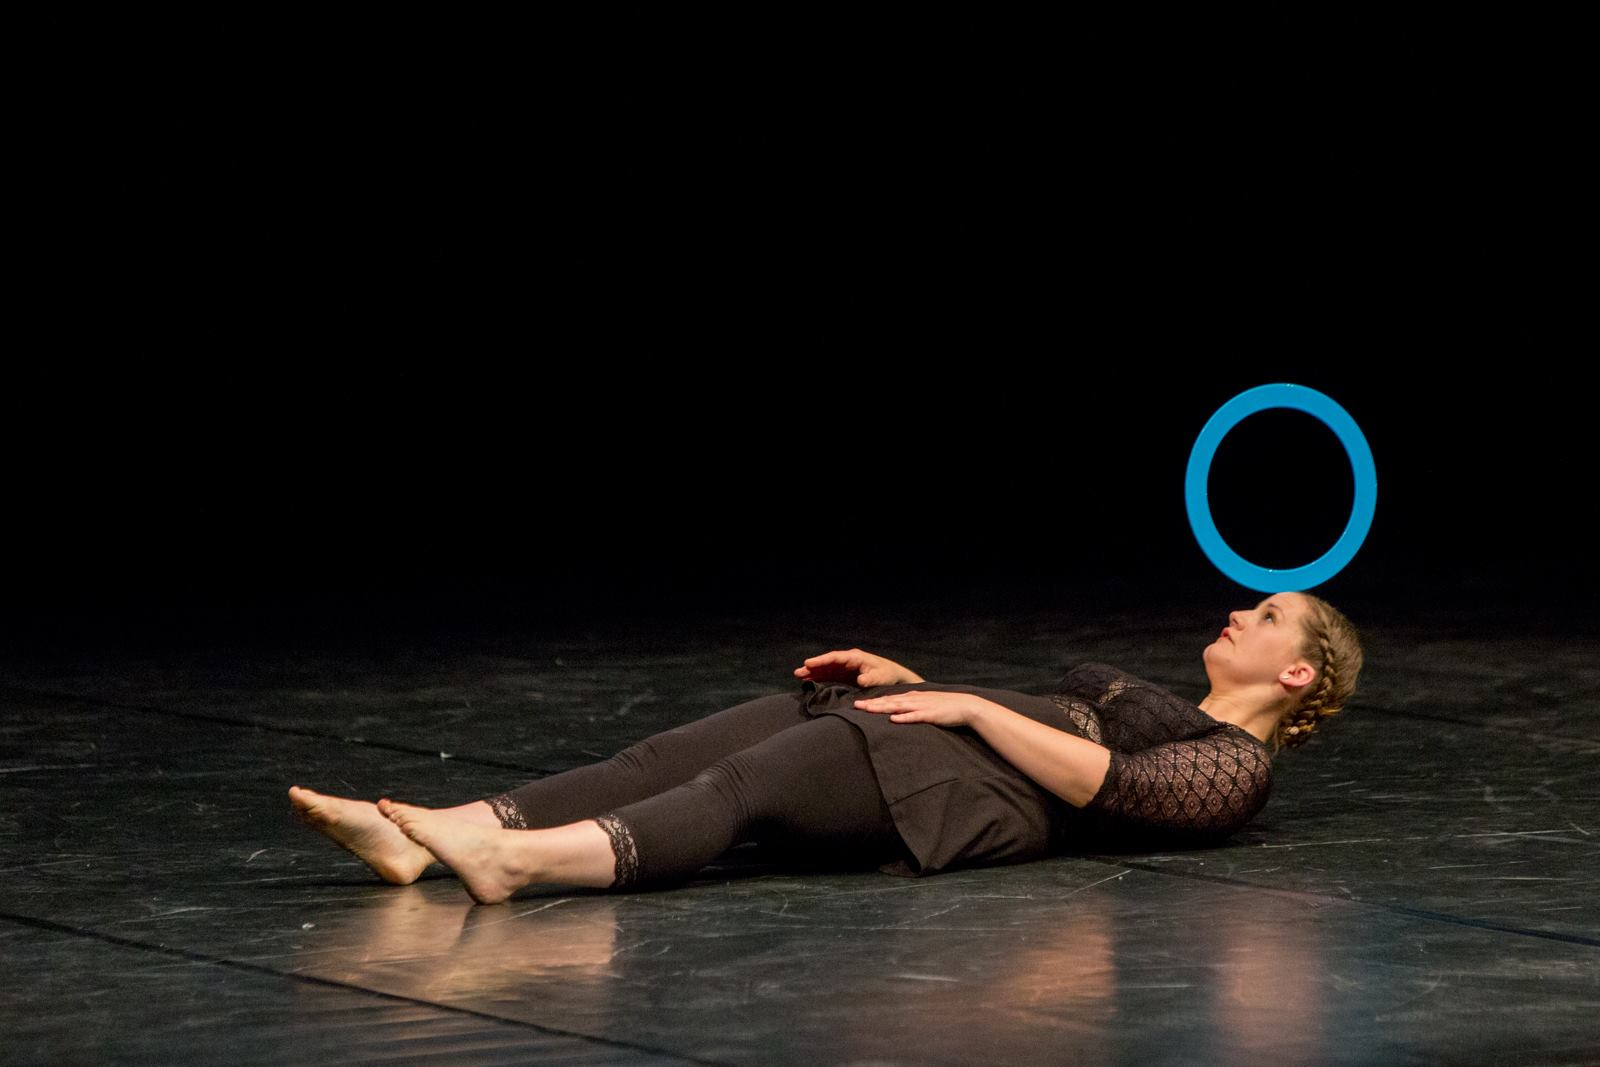 kathrin wagner kathrings ring balance ring juggling jongleurin